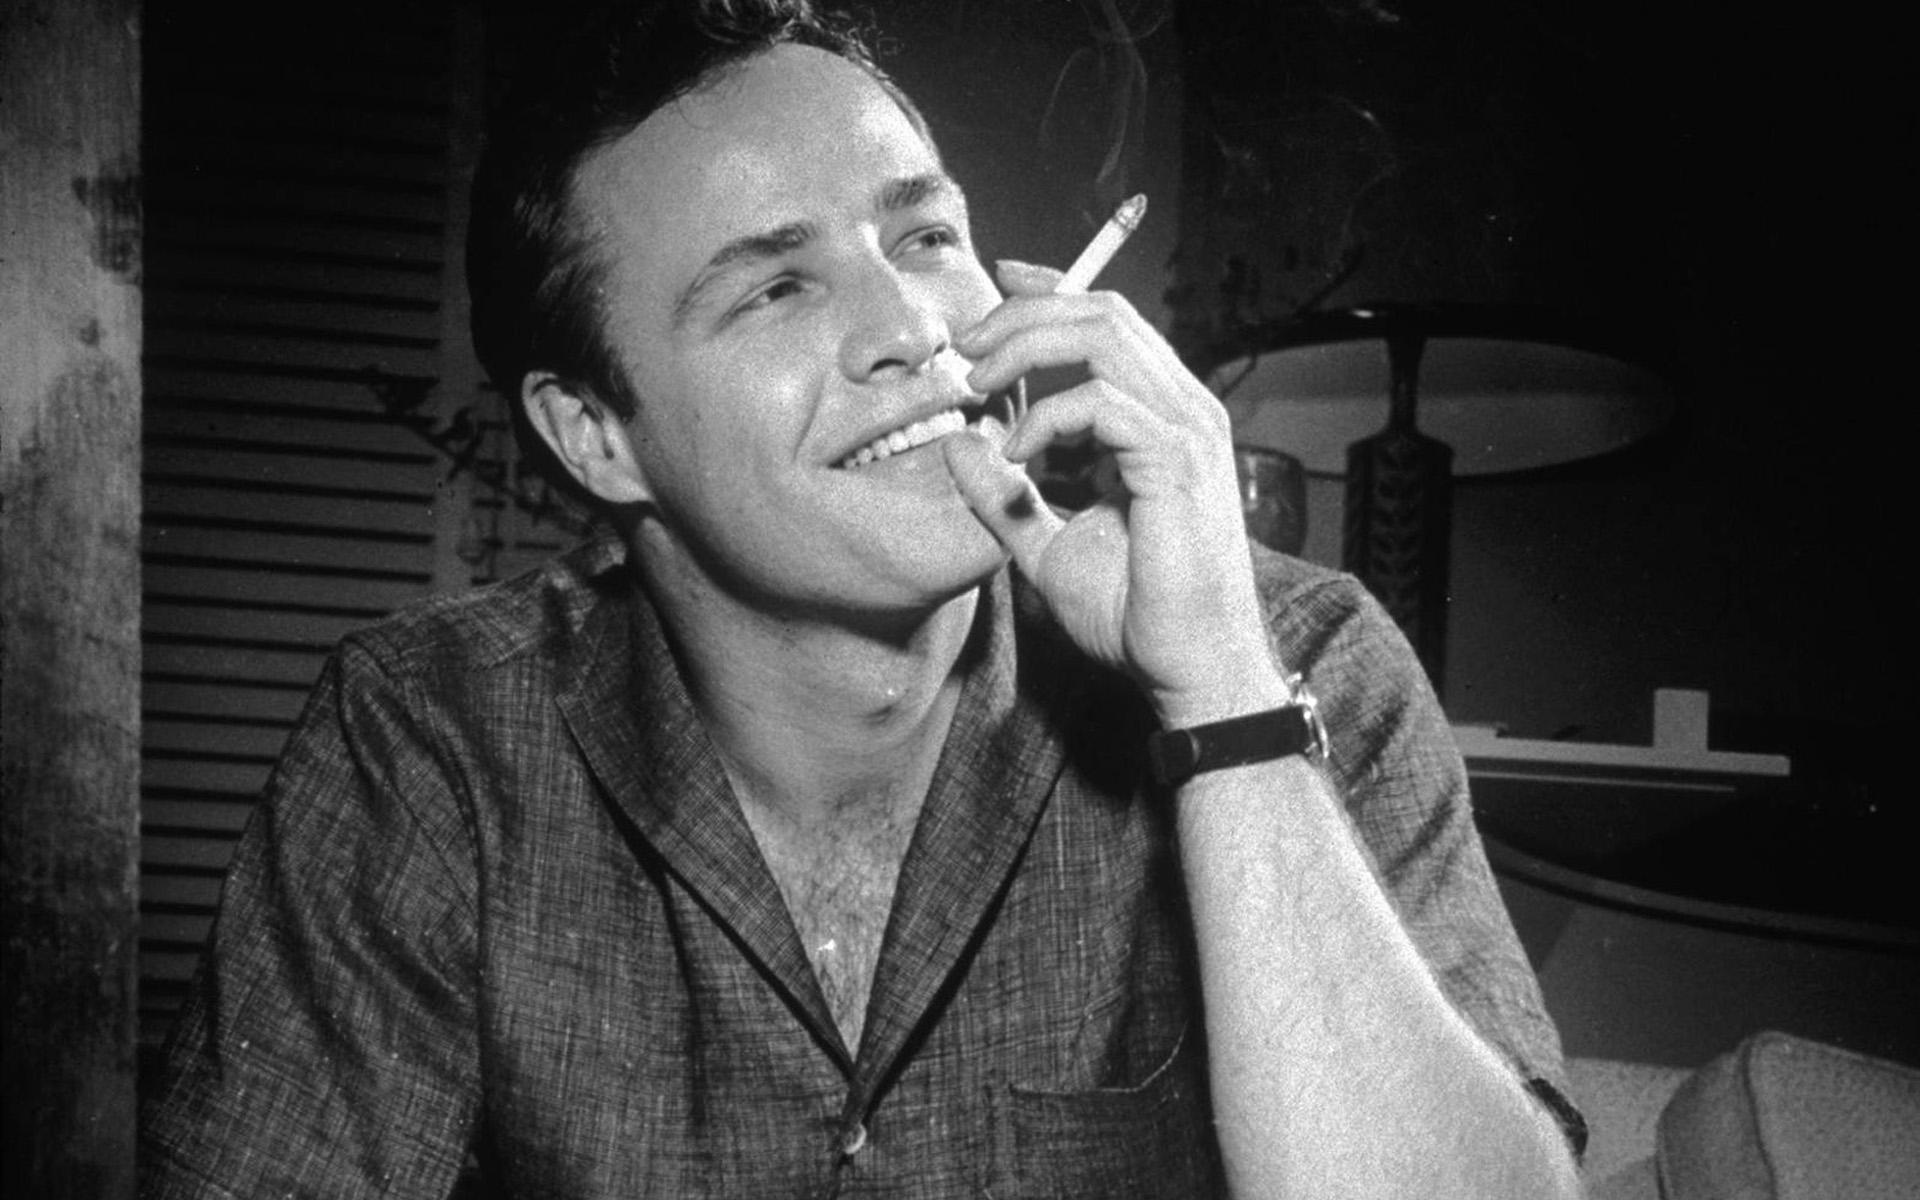 Marlon Brando Hd - HD Wallpaper